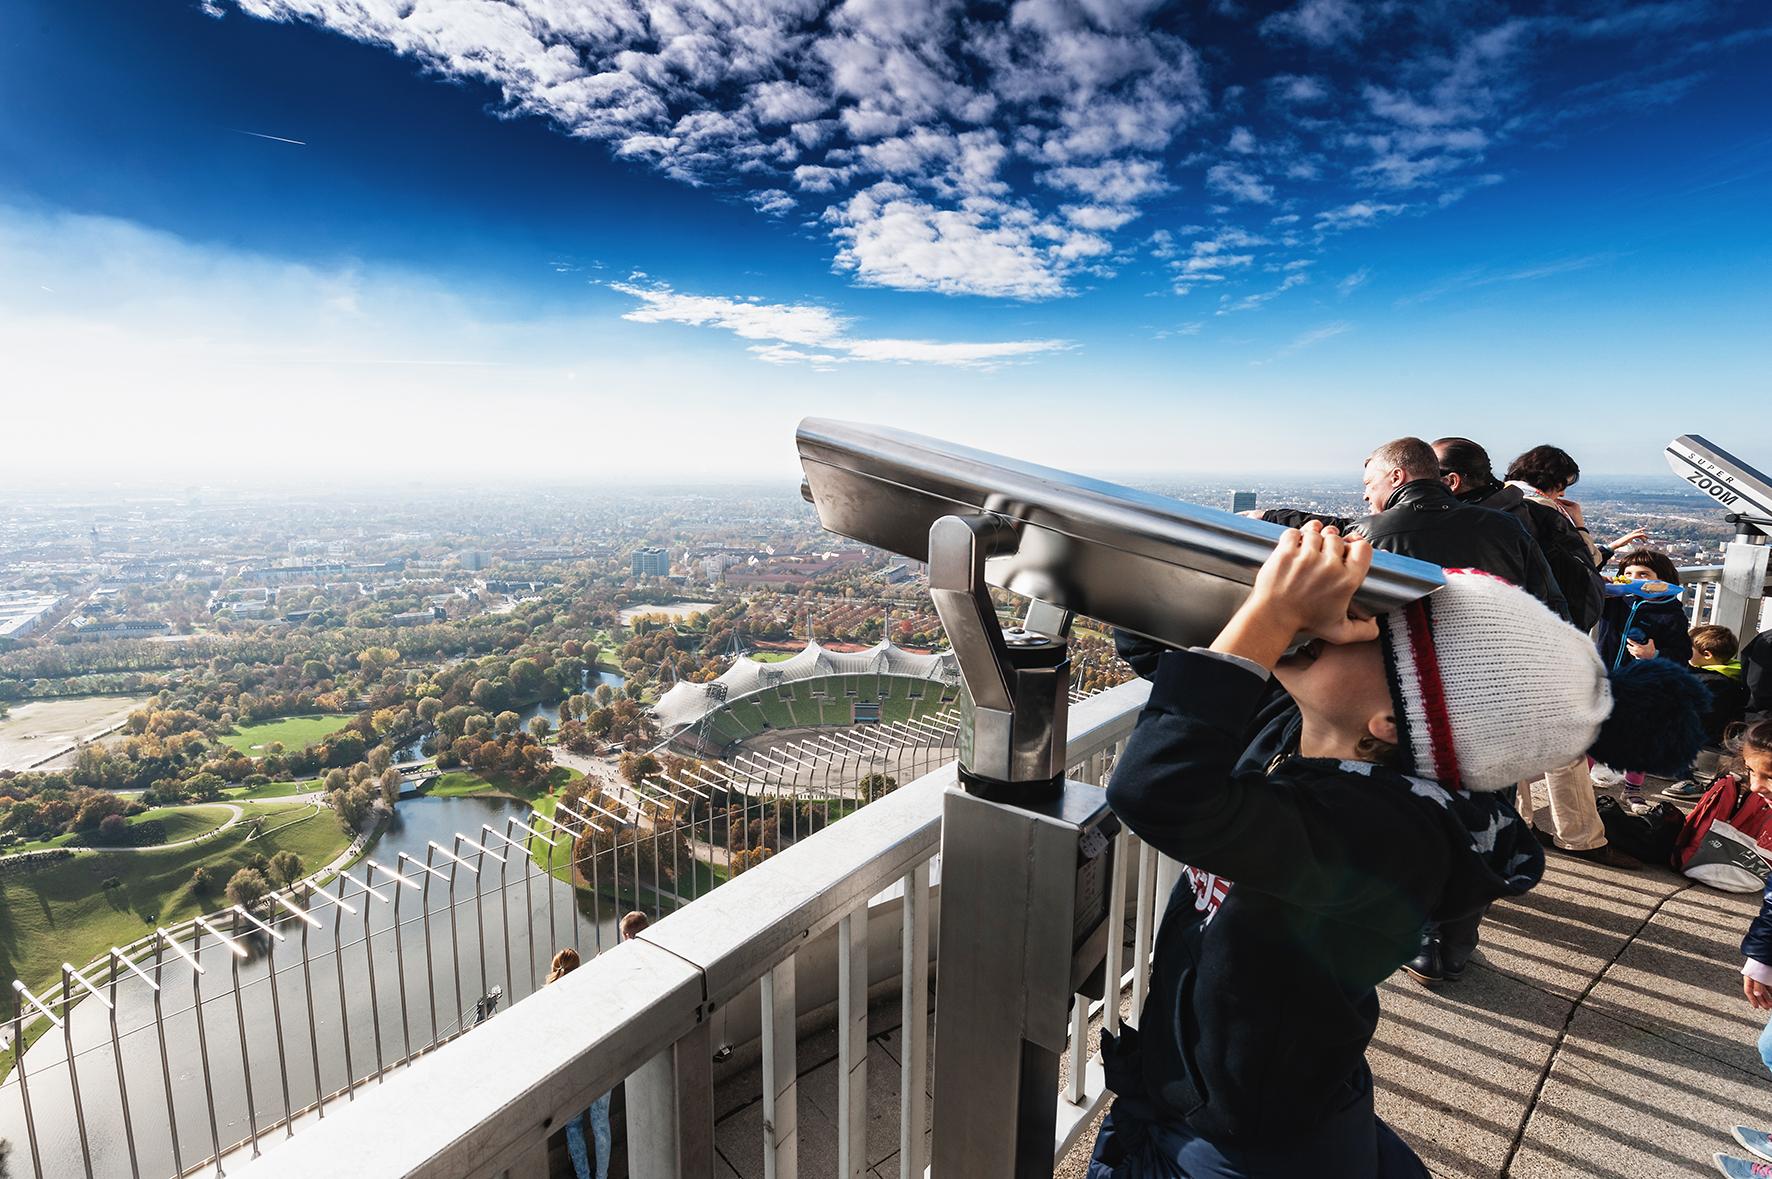 Streetphotography Workshop in Munich